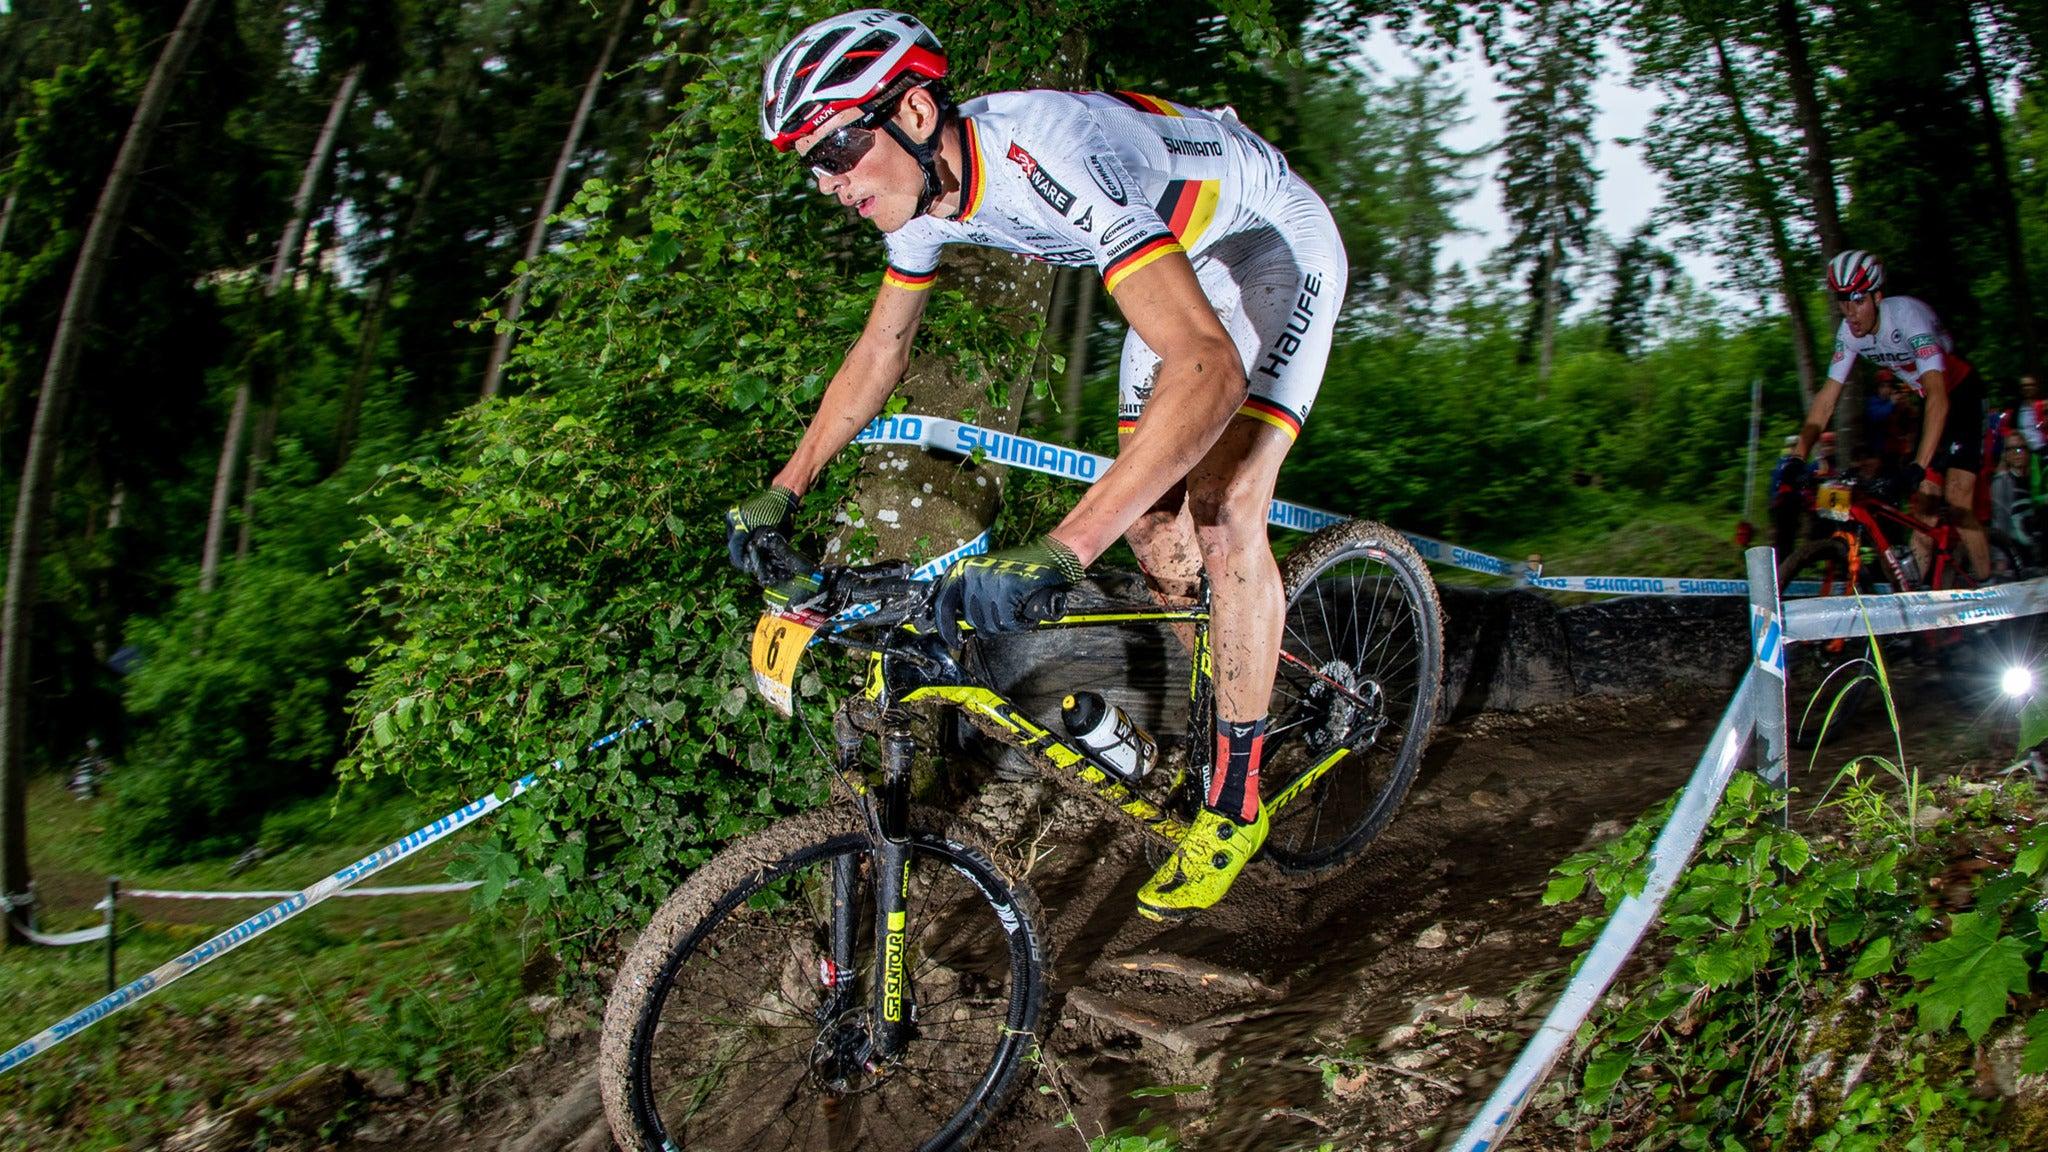 2020 UCI Mountain Bike World Championships